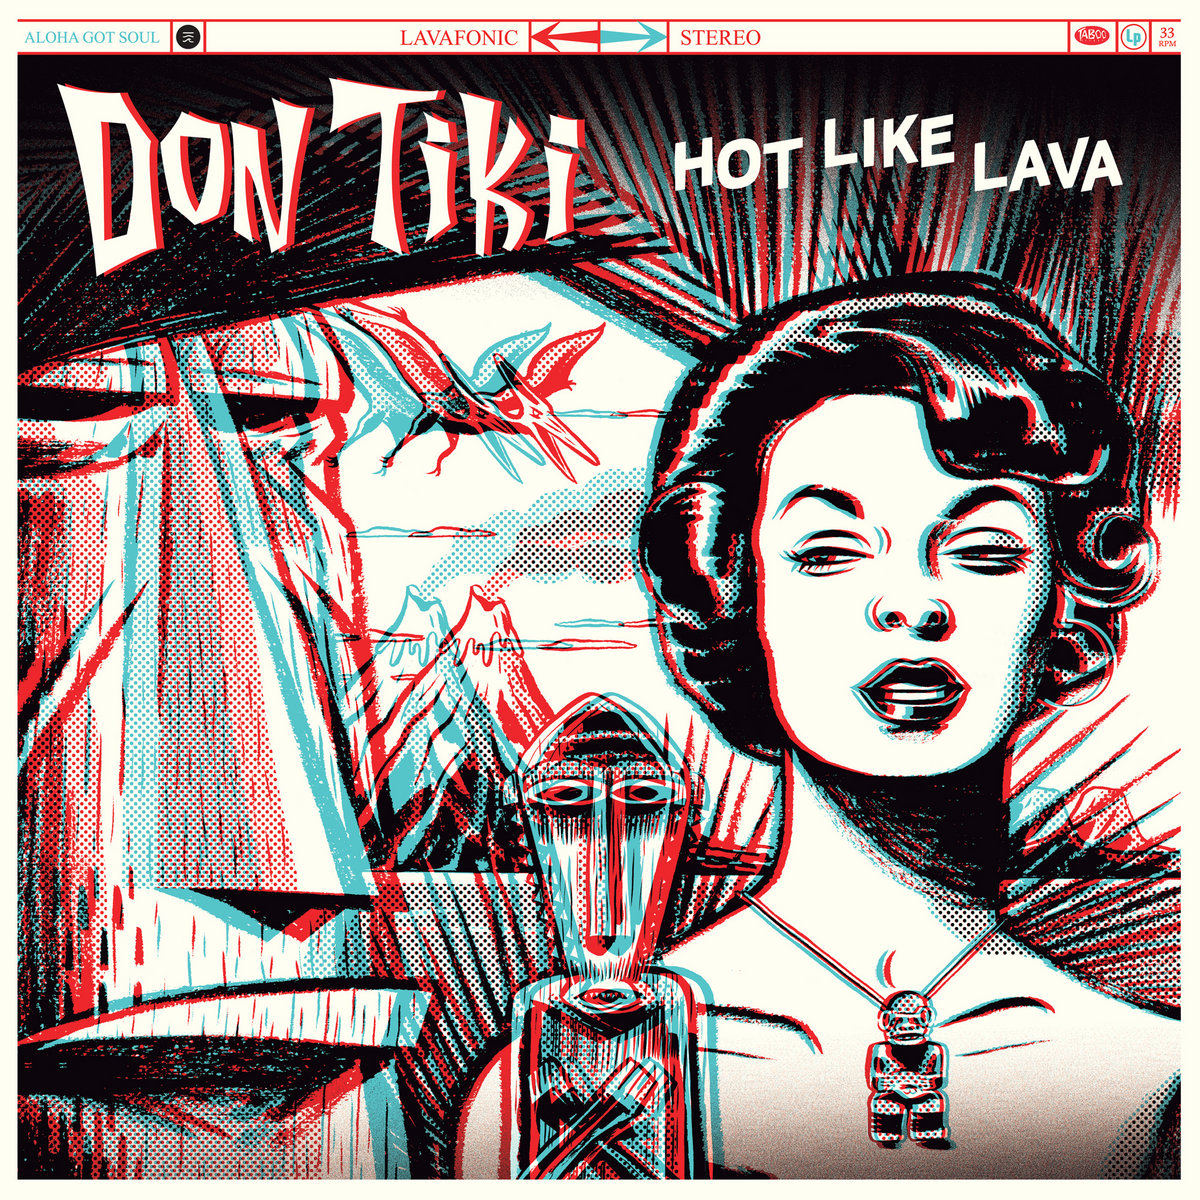 Don Tiki : Hot Like Lava